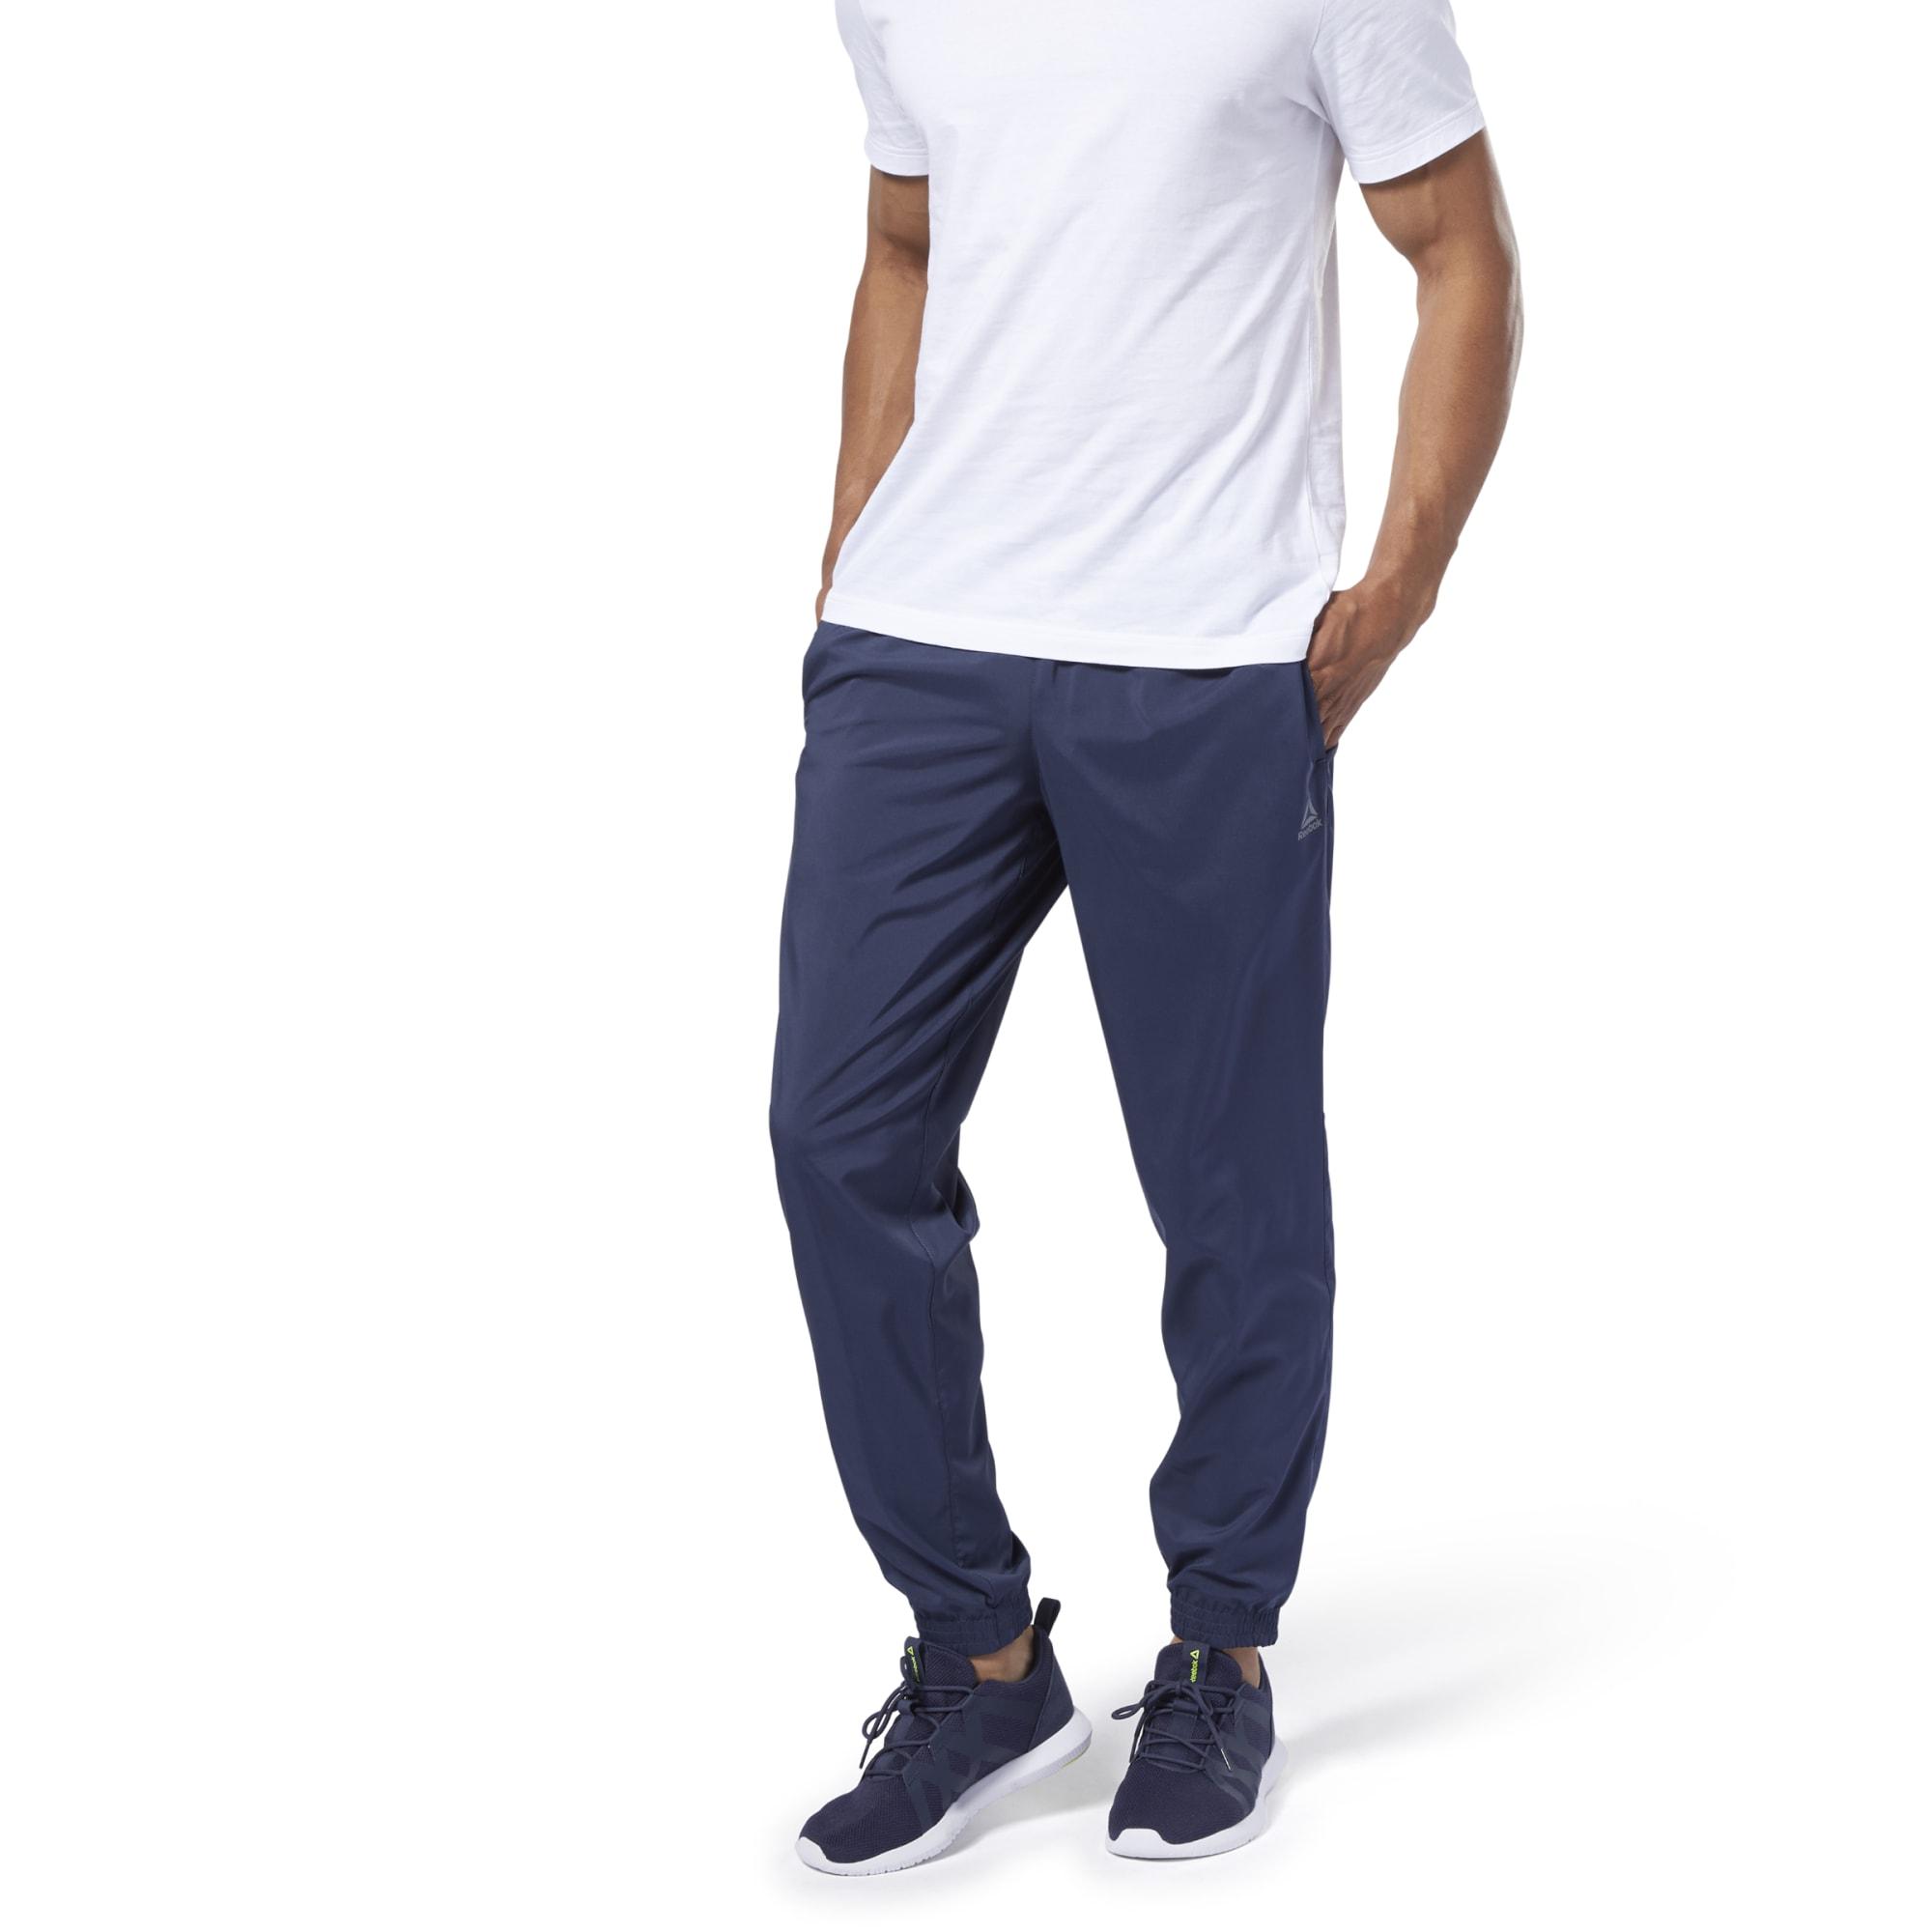 Спортивные брюки Training Essentials Woven C Lined